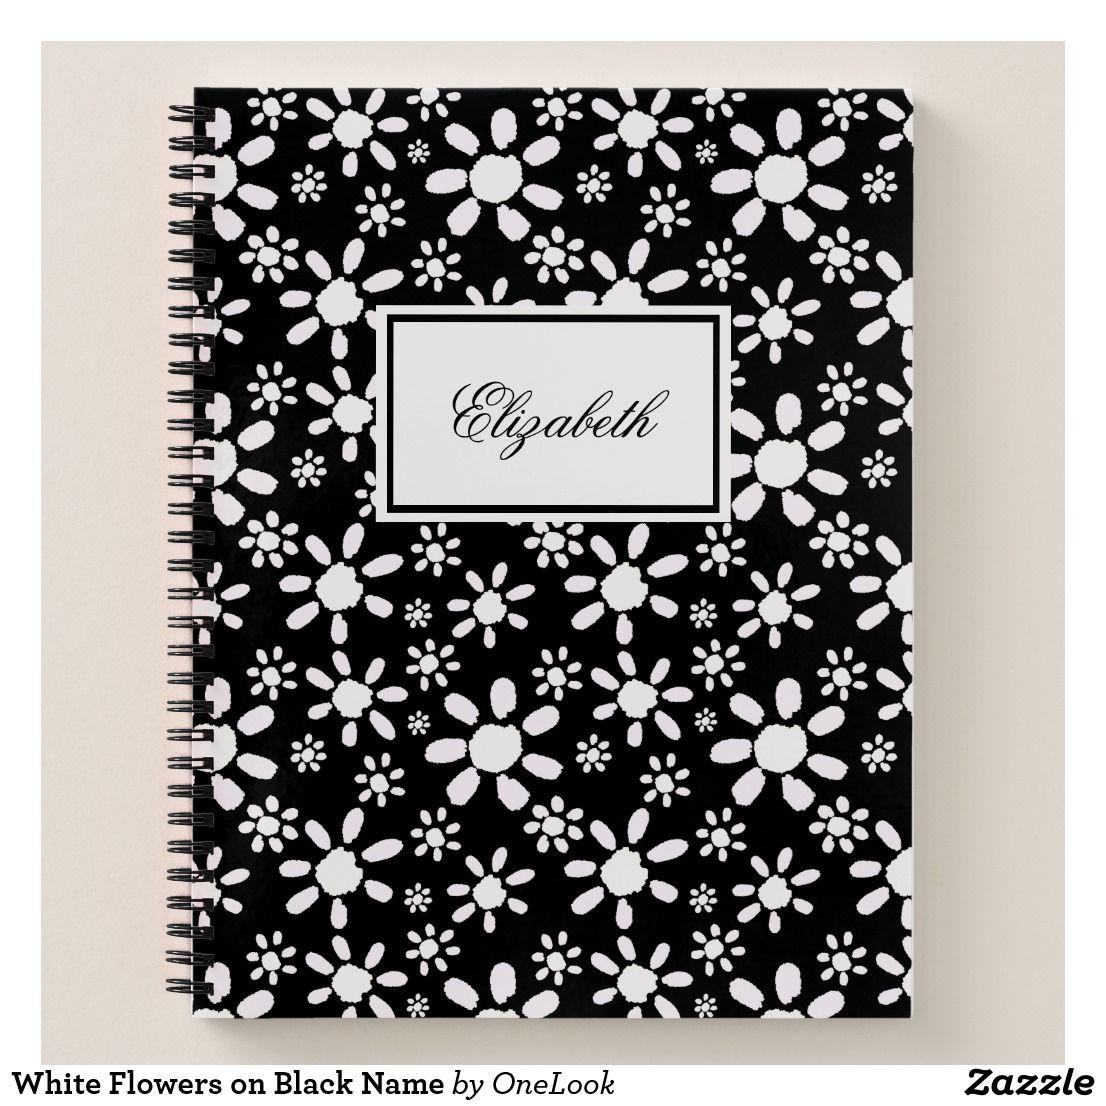 White Flowers on Black Name White flowers, Blackest